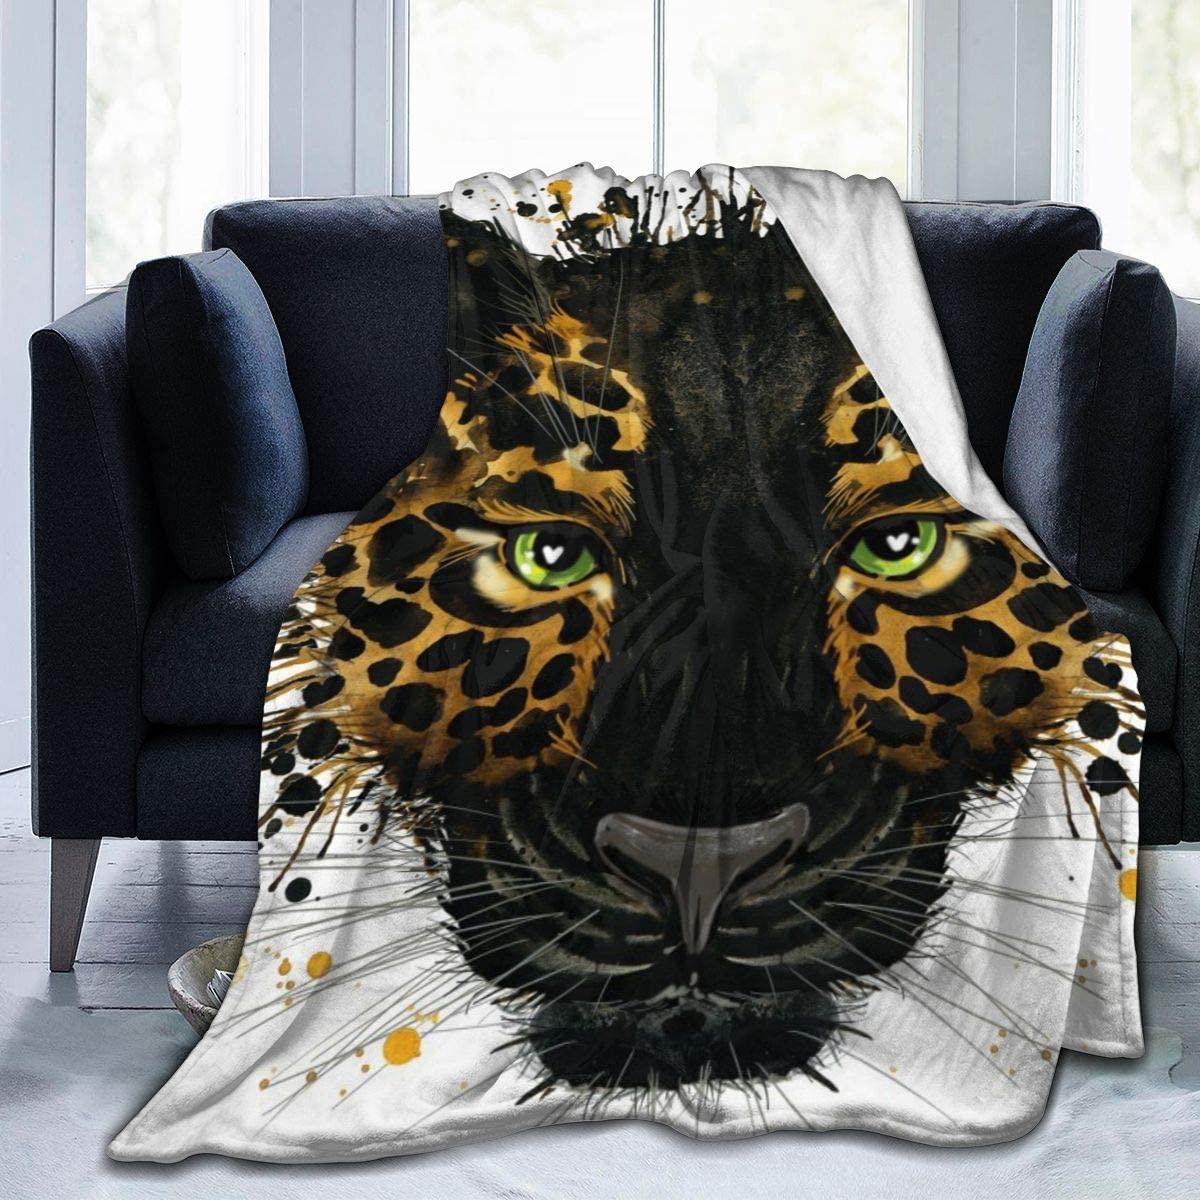 Micro Fleece Plush Soft Baby Blanket Cute Animal Jaguar Face Fluffy Warm Toddler Bed/Crib Blanket Lightweight Flannel Daycare Nap Kids Sleeping Tummy Time Throw Blanket Girls Boy Clearance Kid/Baby